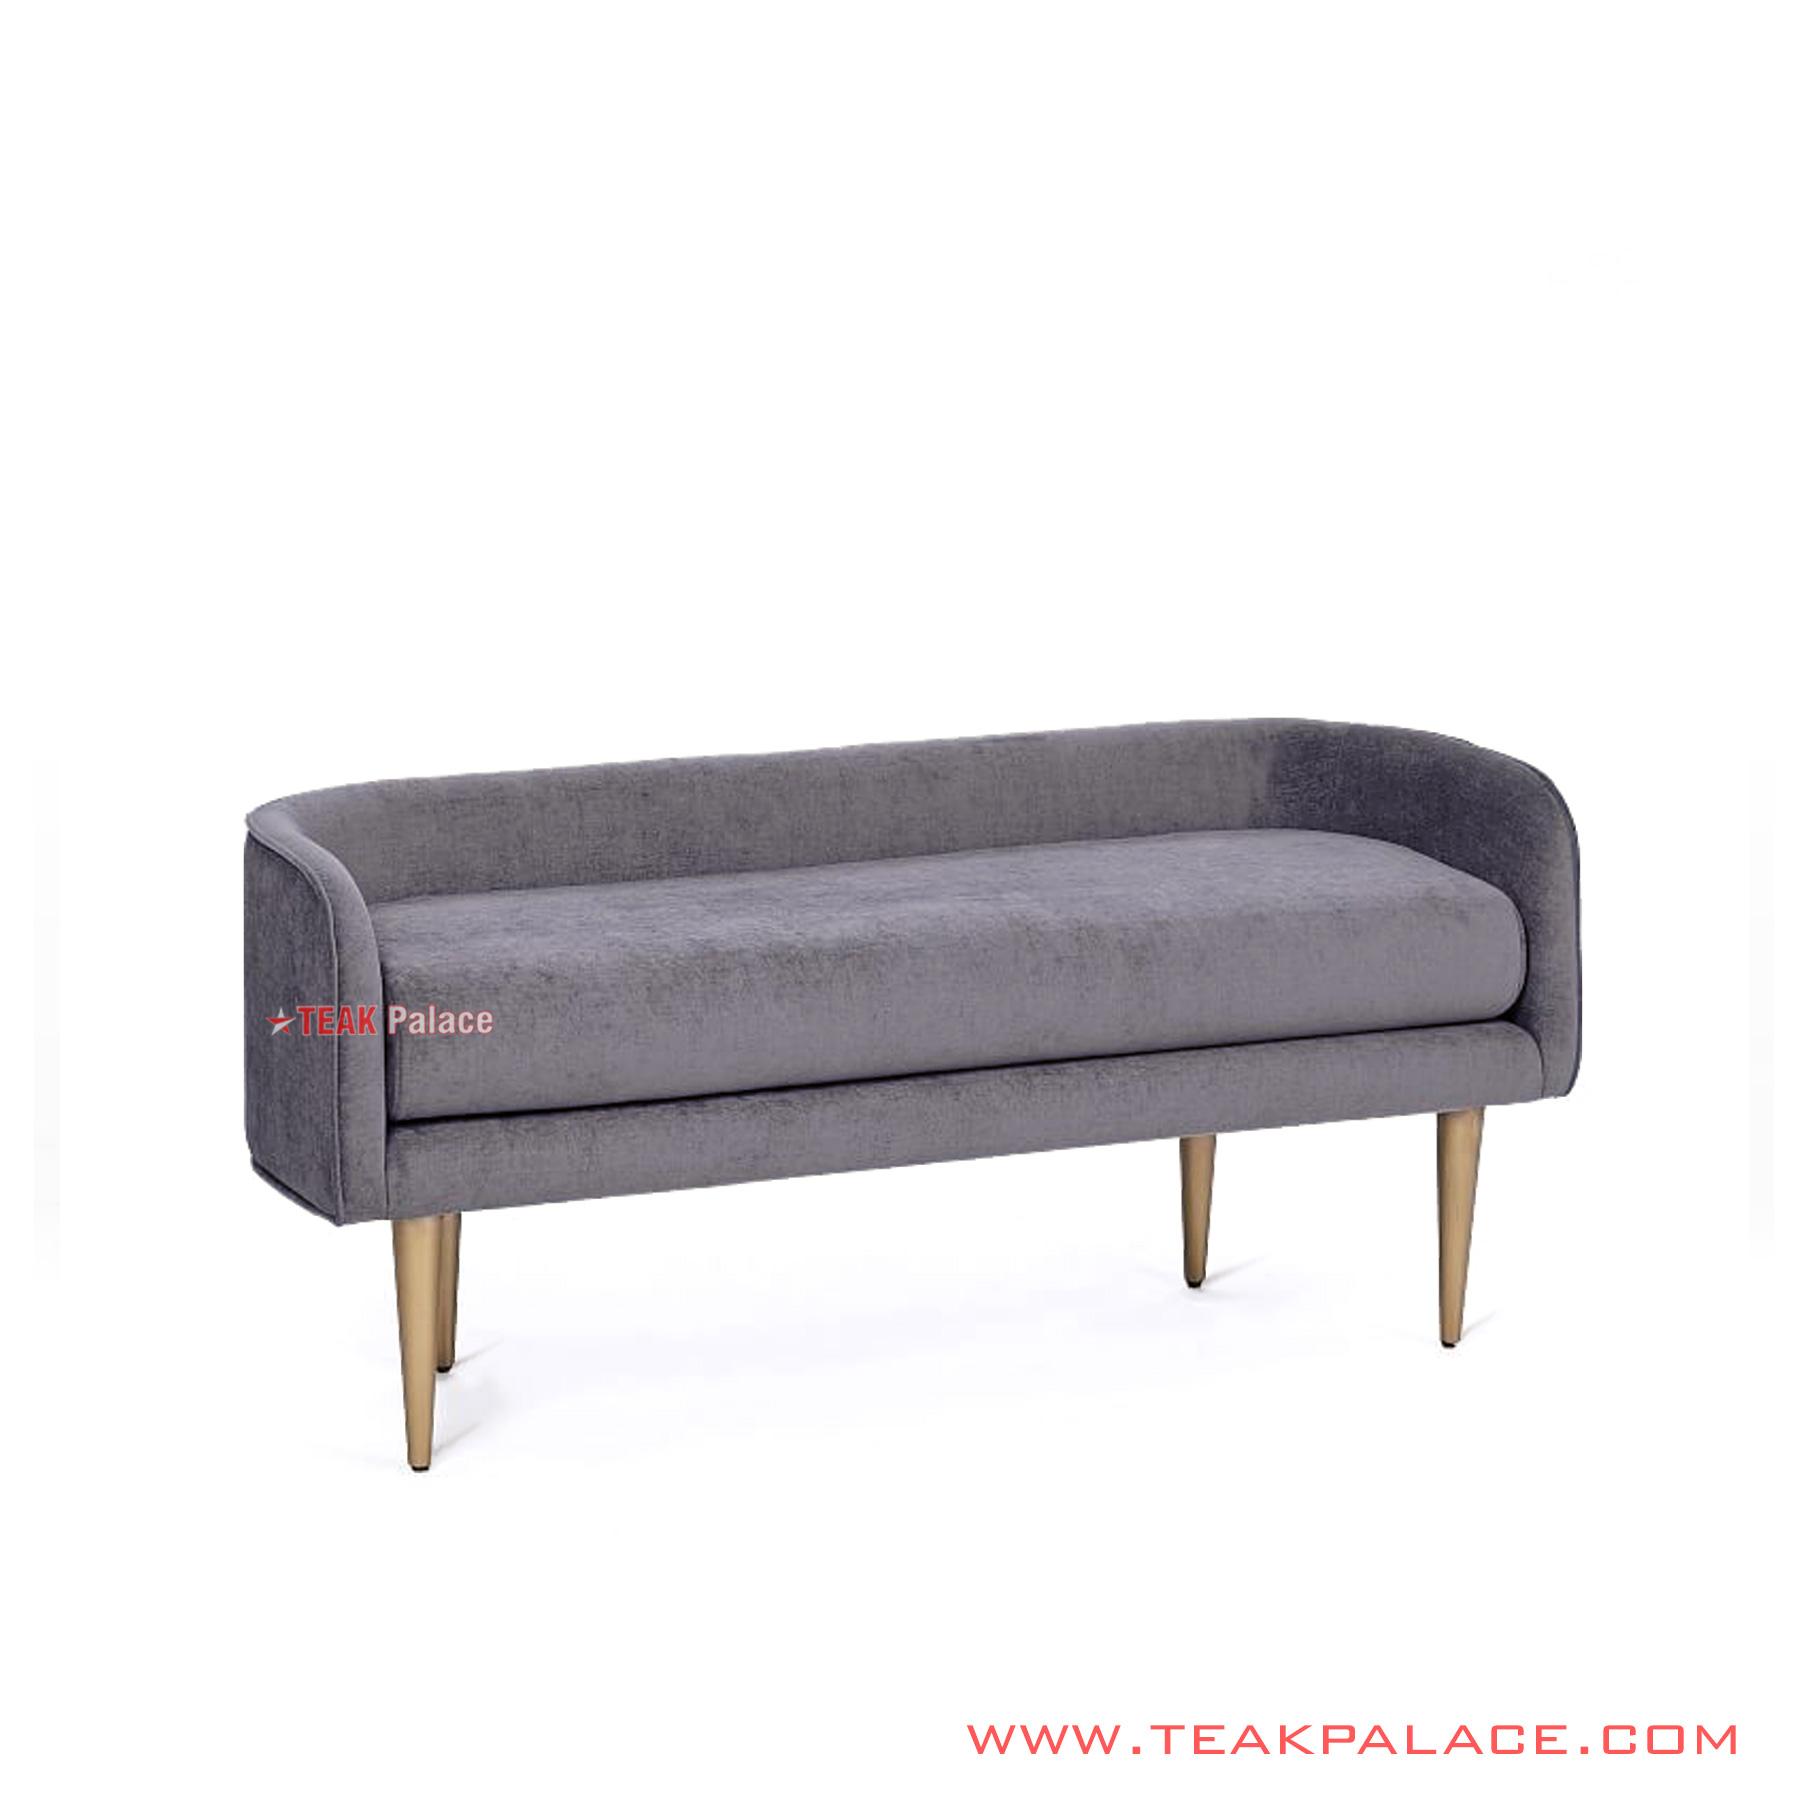 Living Room Bench Teak Gold Fabric, Living Room Bench